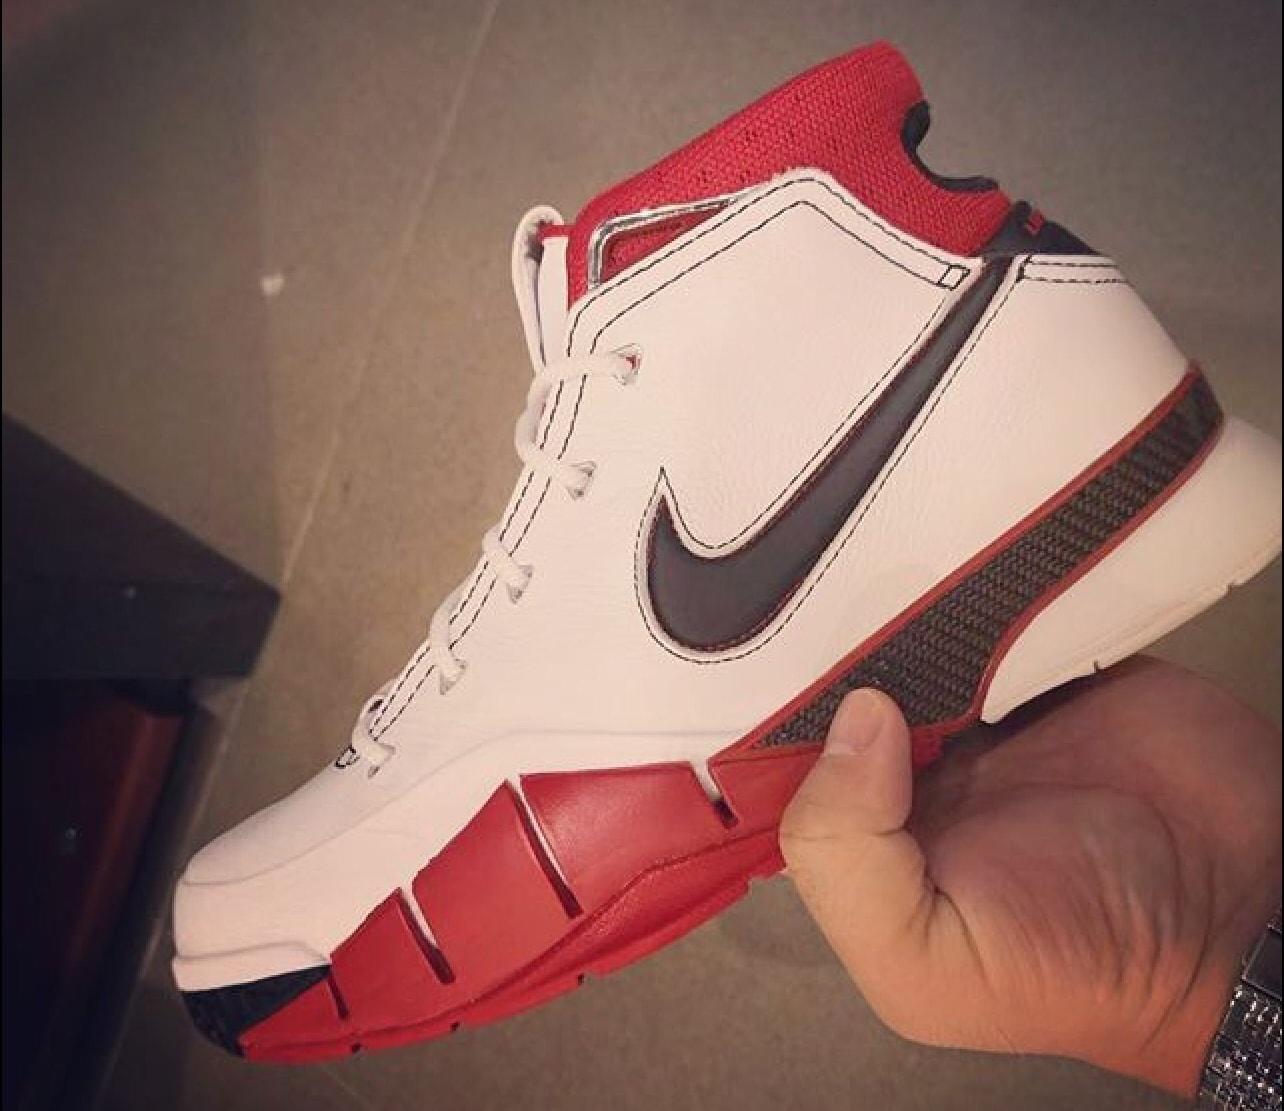 cfaf7d715578 Image via Hupu · Nike Zoom Kobe 1 Protro All-Star Release Date AQ2728-102  Profile